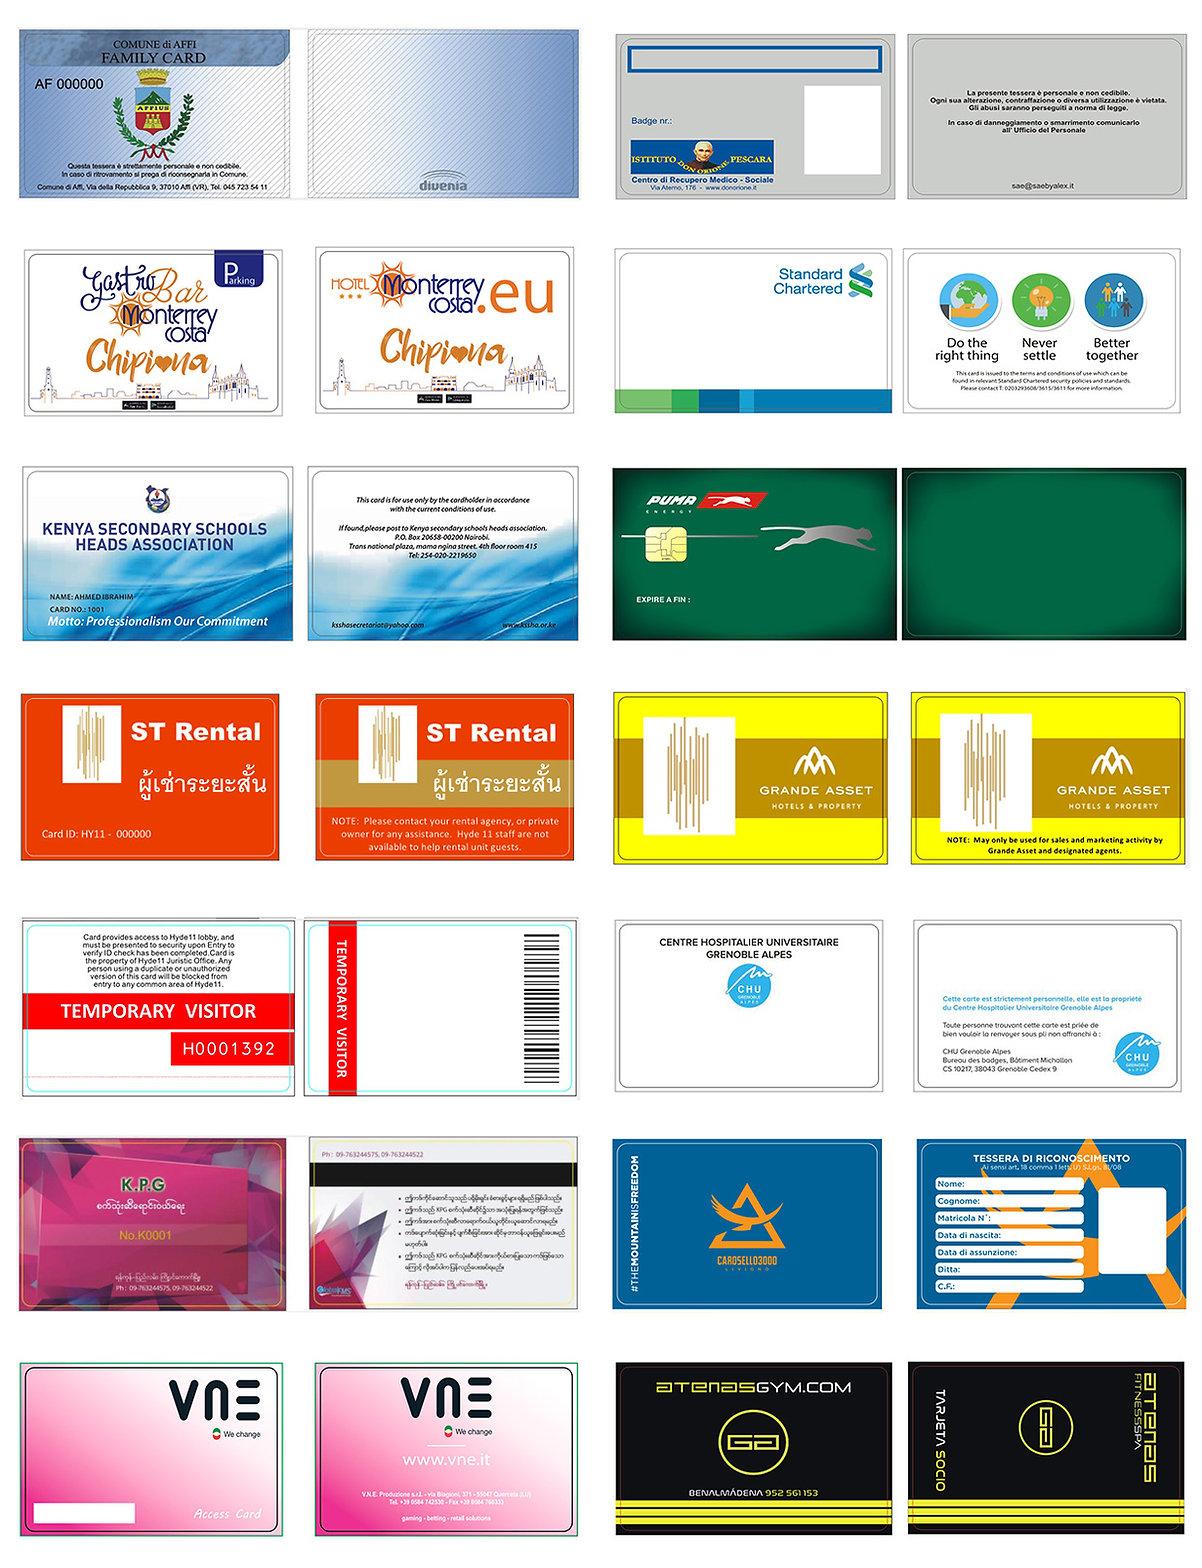 Identification-card-templates.jpg